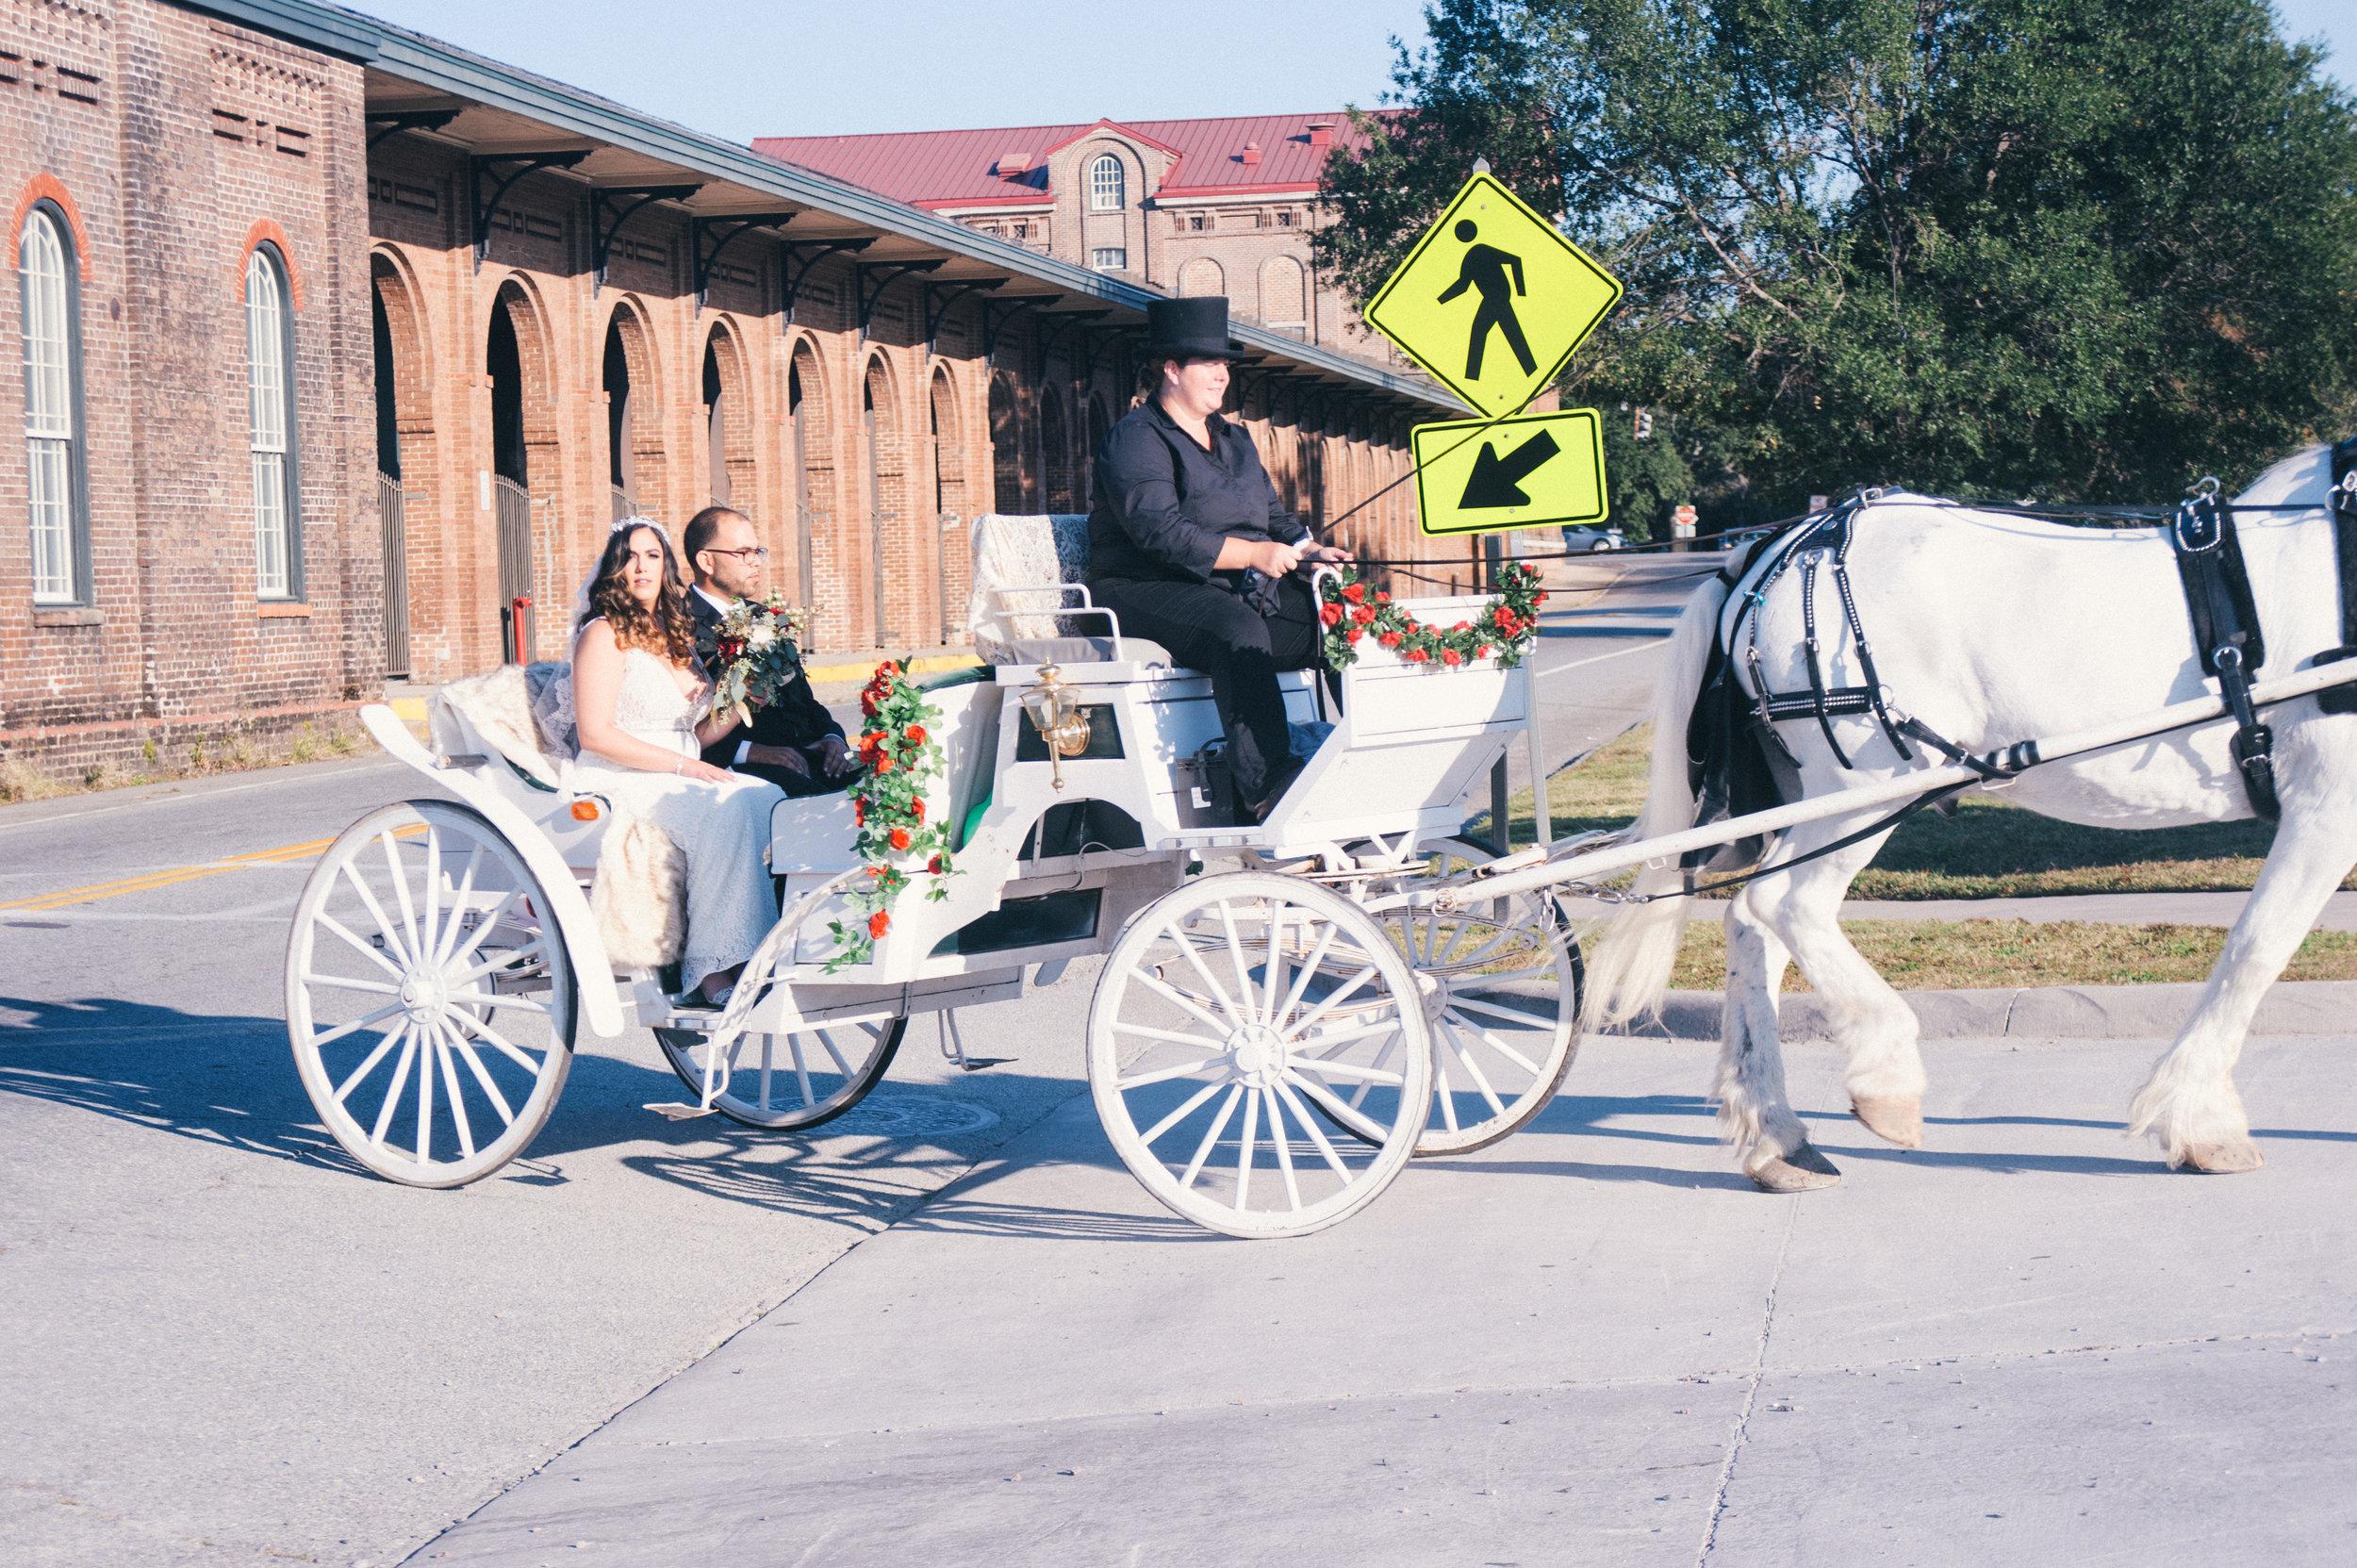 Iggy-and-yesenia-savannah-railroad-museum-wedding-meg-hill-photo- (330 of 866).jpg